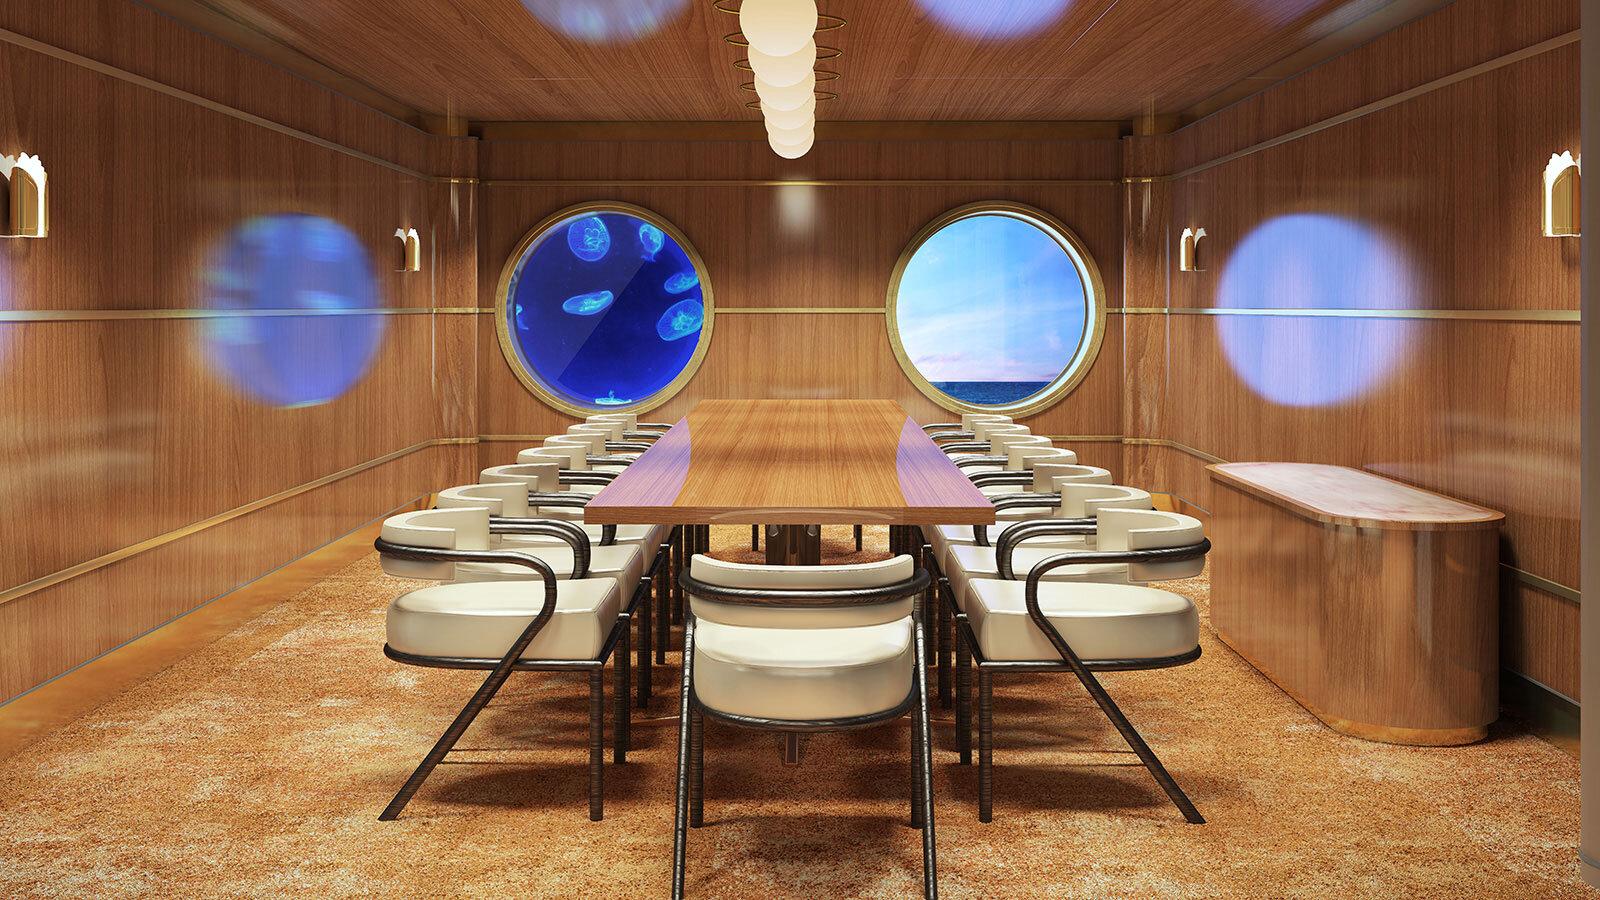 RDR-FNB-the-wake-restaurant-private-dining-room-v1-01-1600x900.jpg